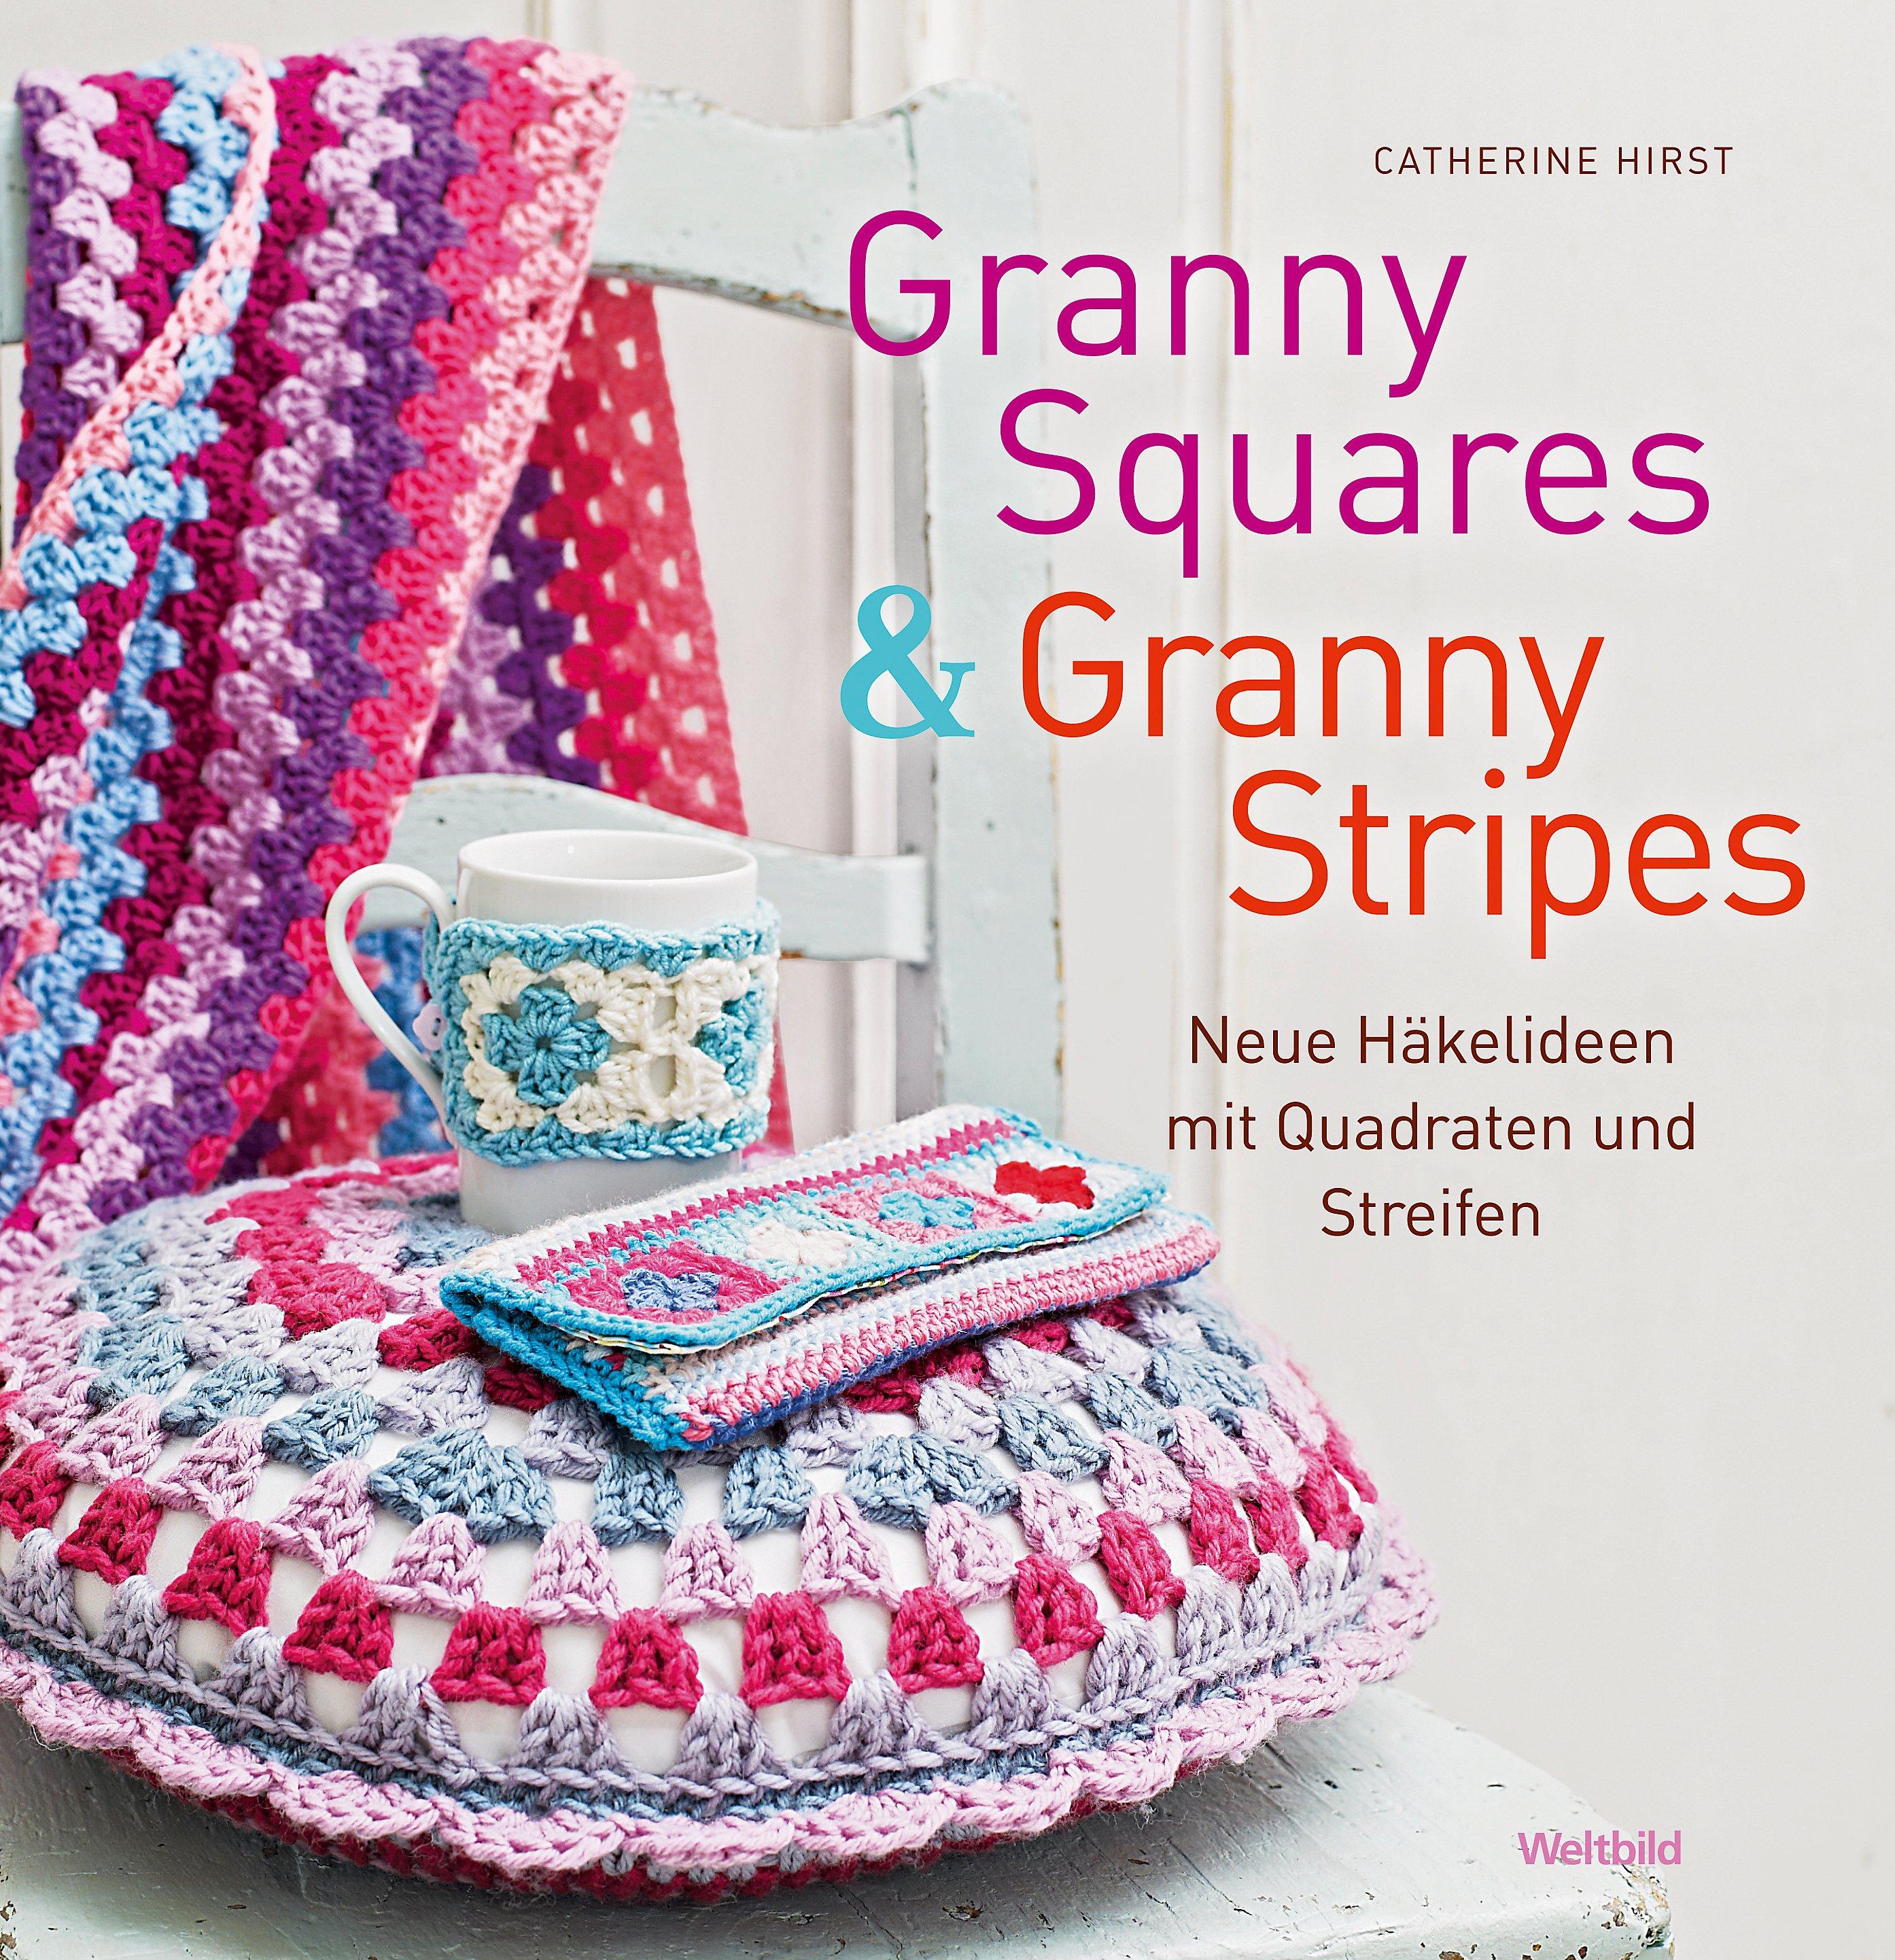 Granny Squares Granny Stripes Weltbild Ausgabe Bestellen